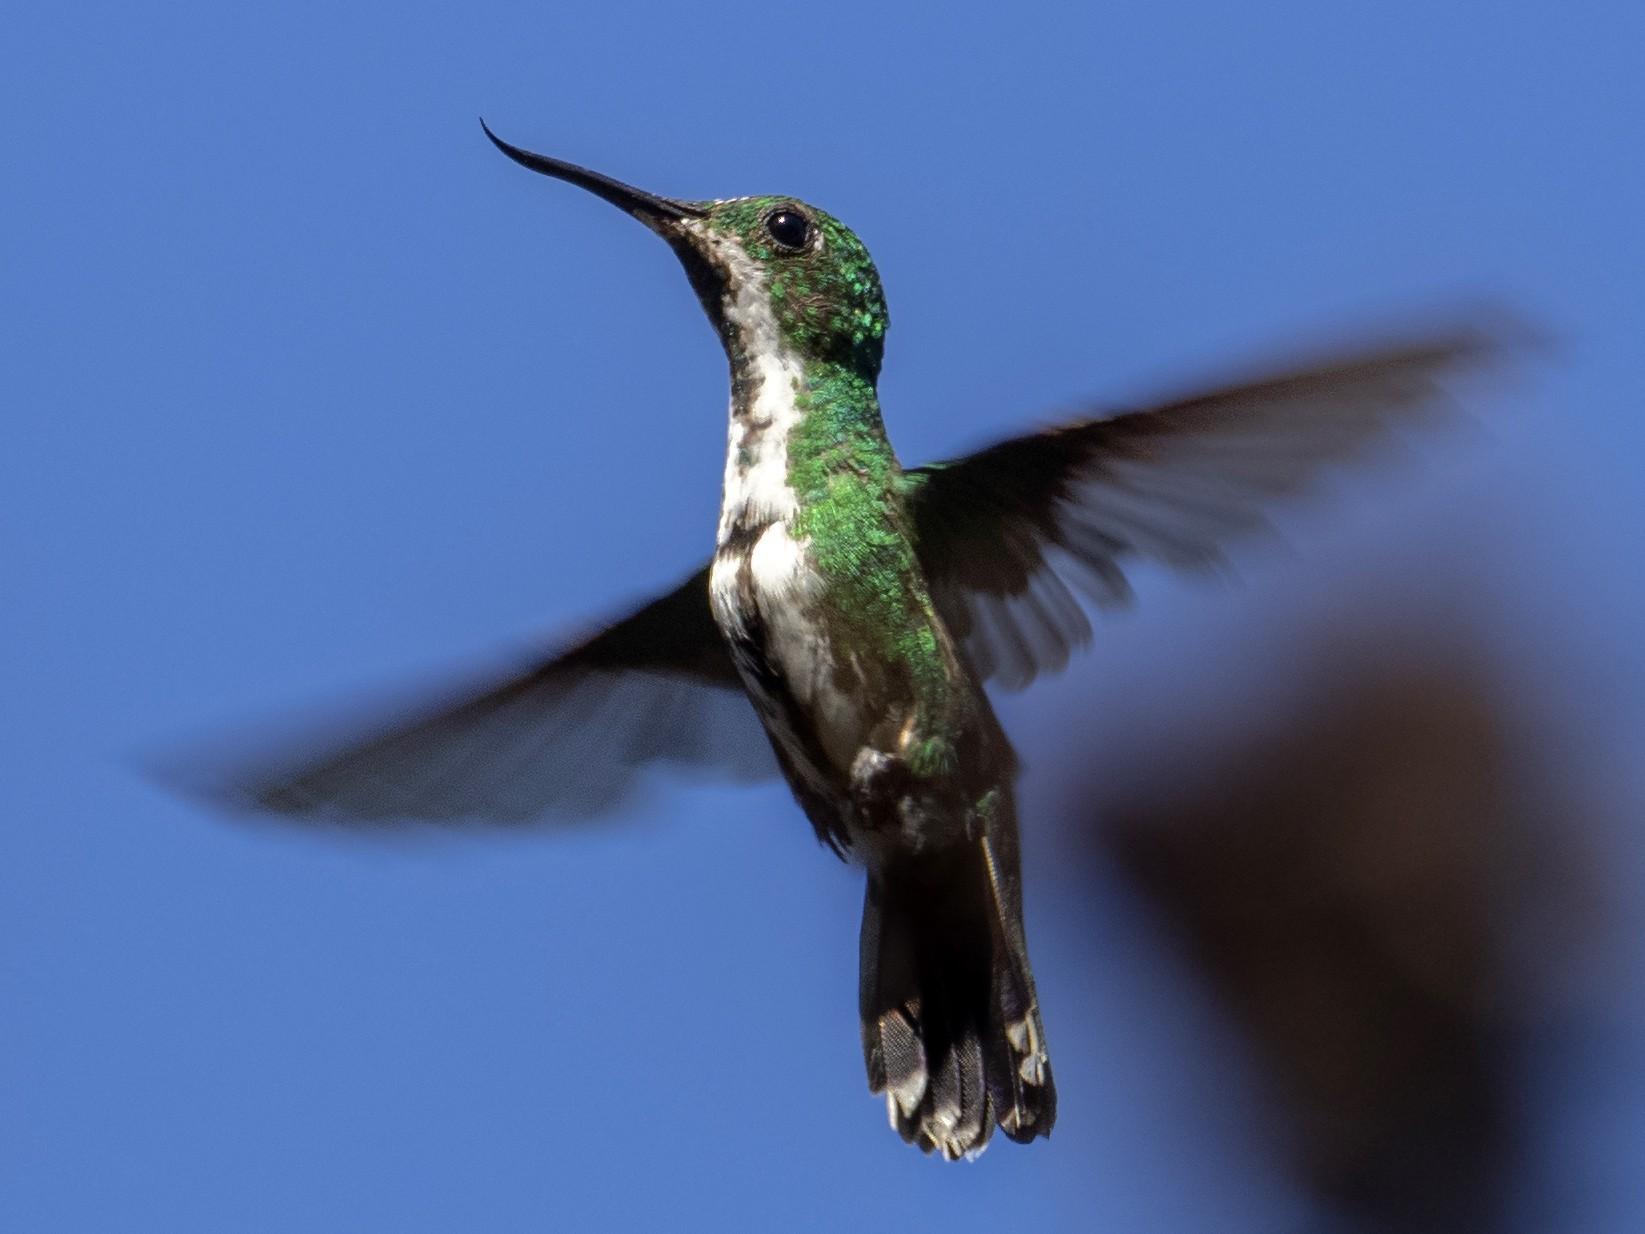 Fiery-tailed Awlbill - Andres Vasquez Noboa - Tropical Birding Tours